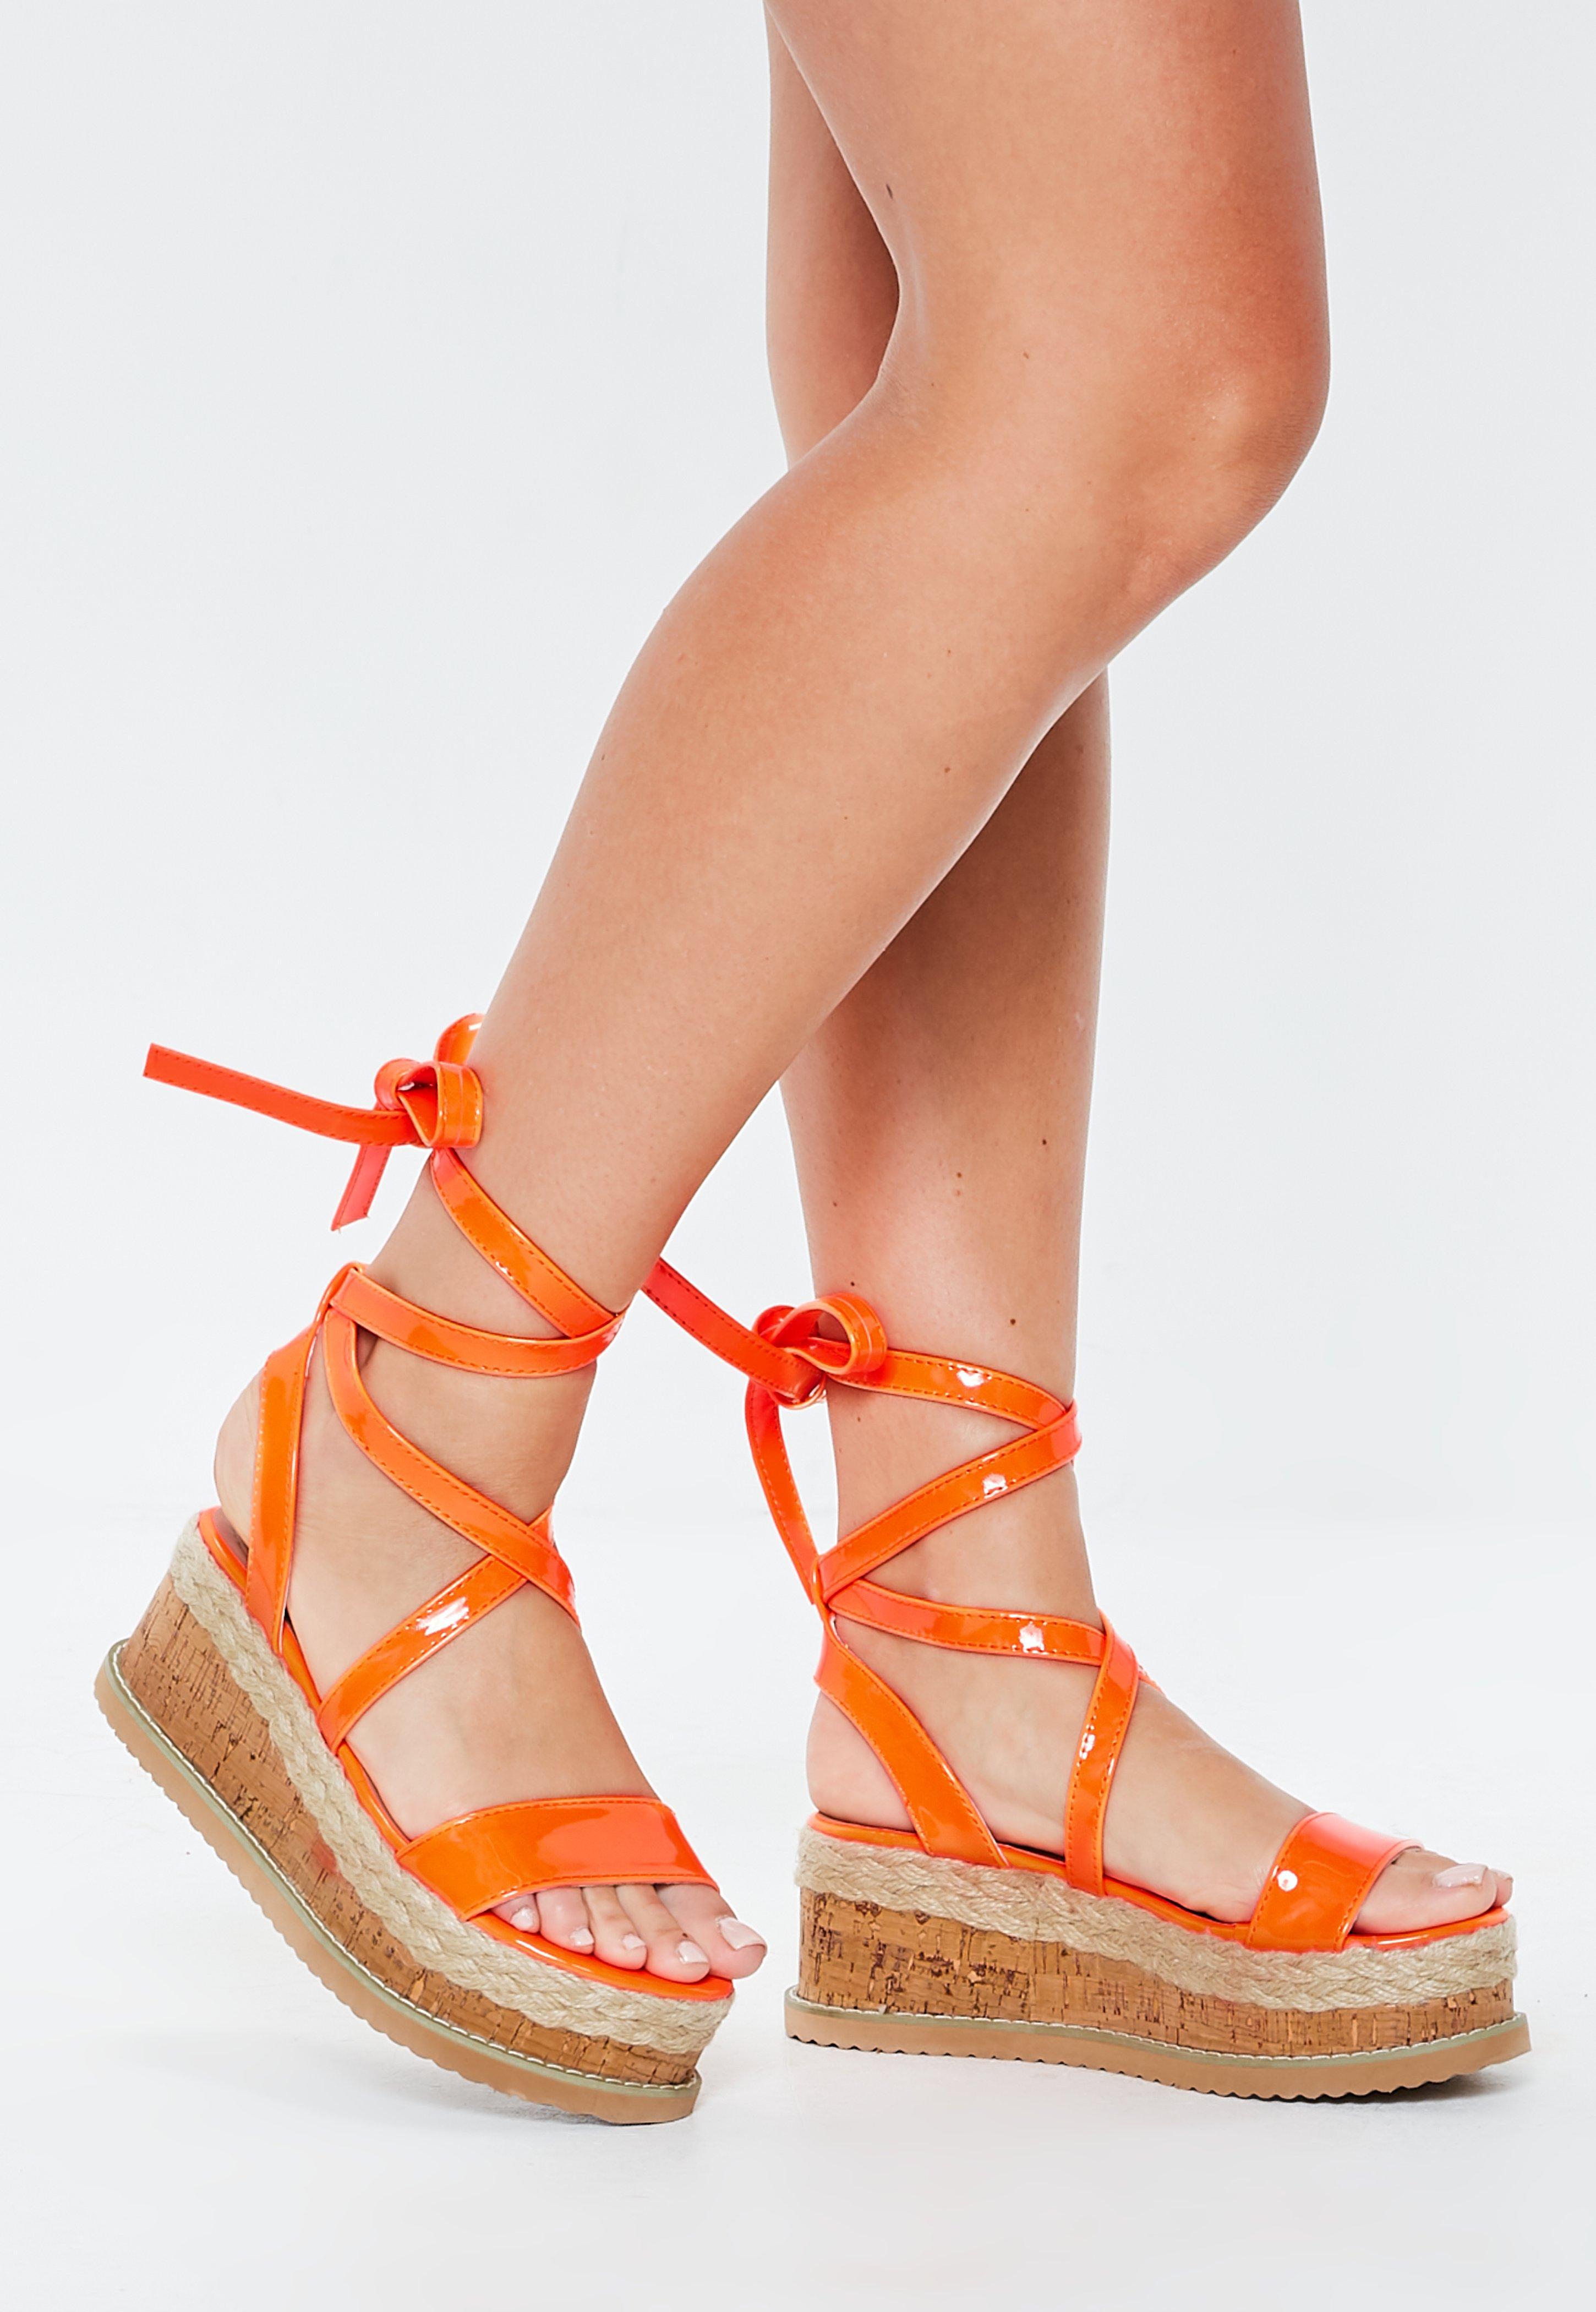 d3dc6a258db1 Women s Flat Sandals   Espadrilles - Missguided